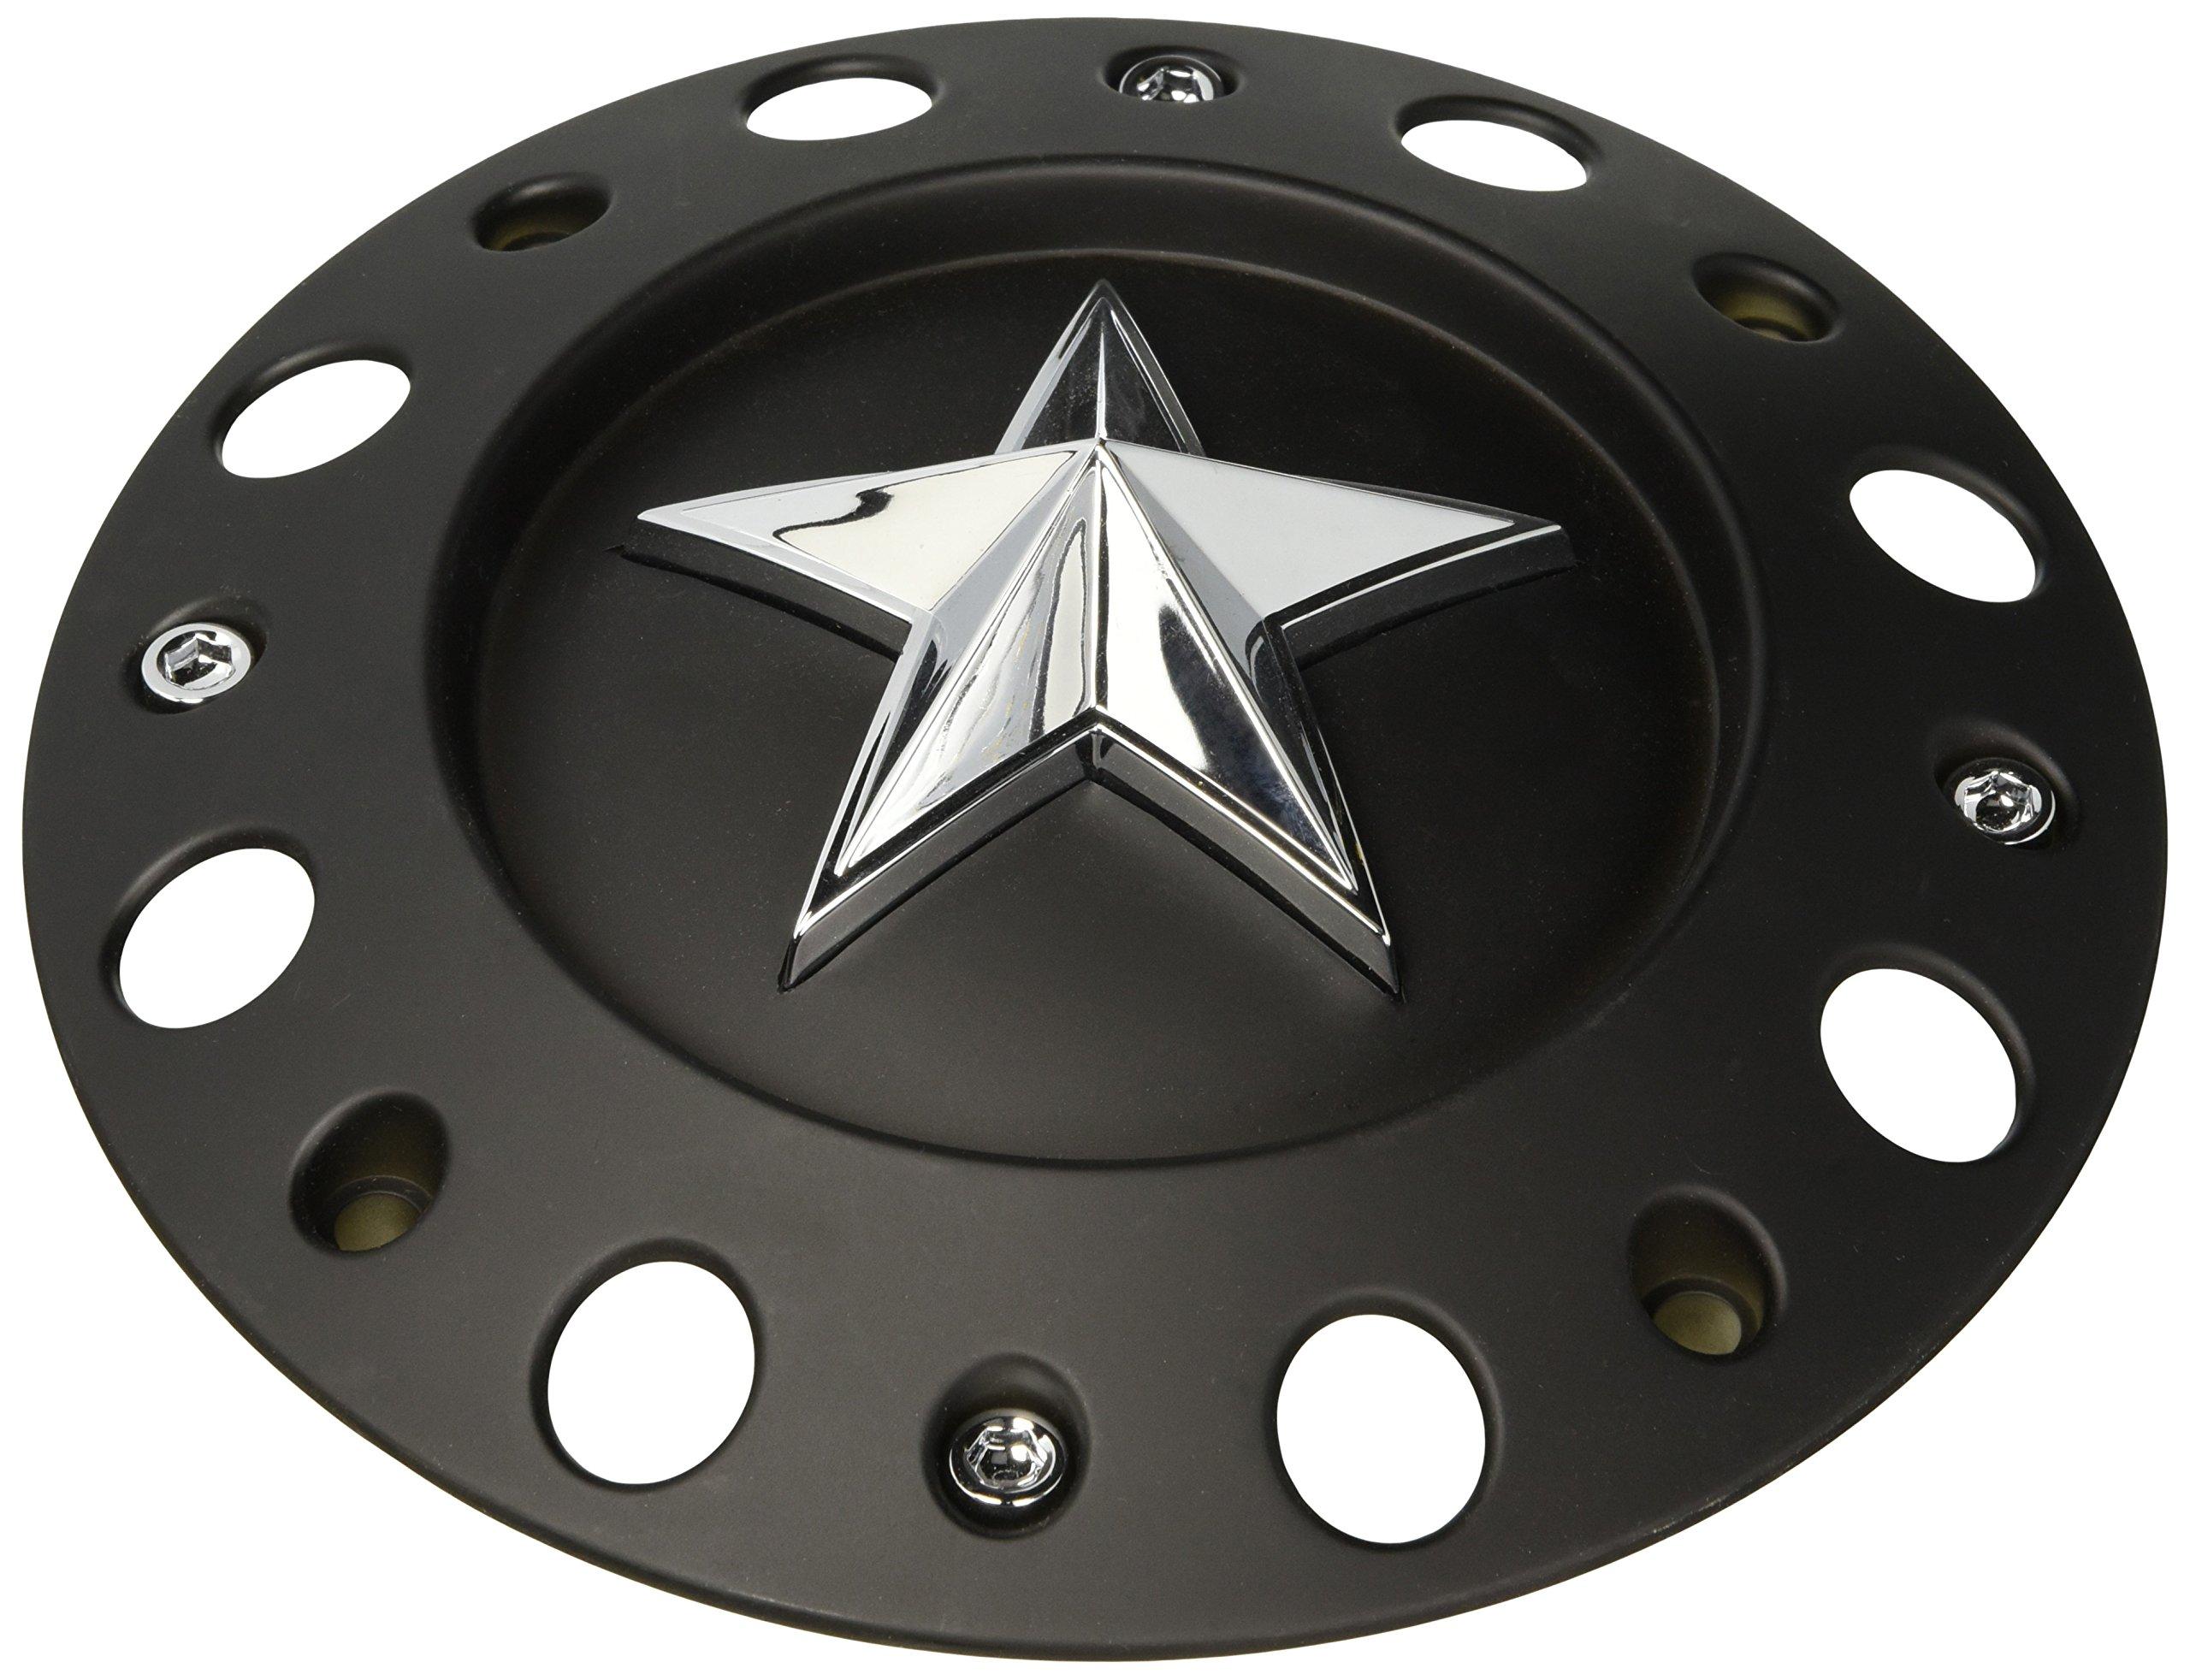 KMC XD Series 811 Rockstar 2 Matte Black w Black Star Center Cap SC-198 SC-190